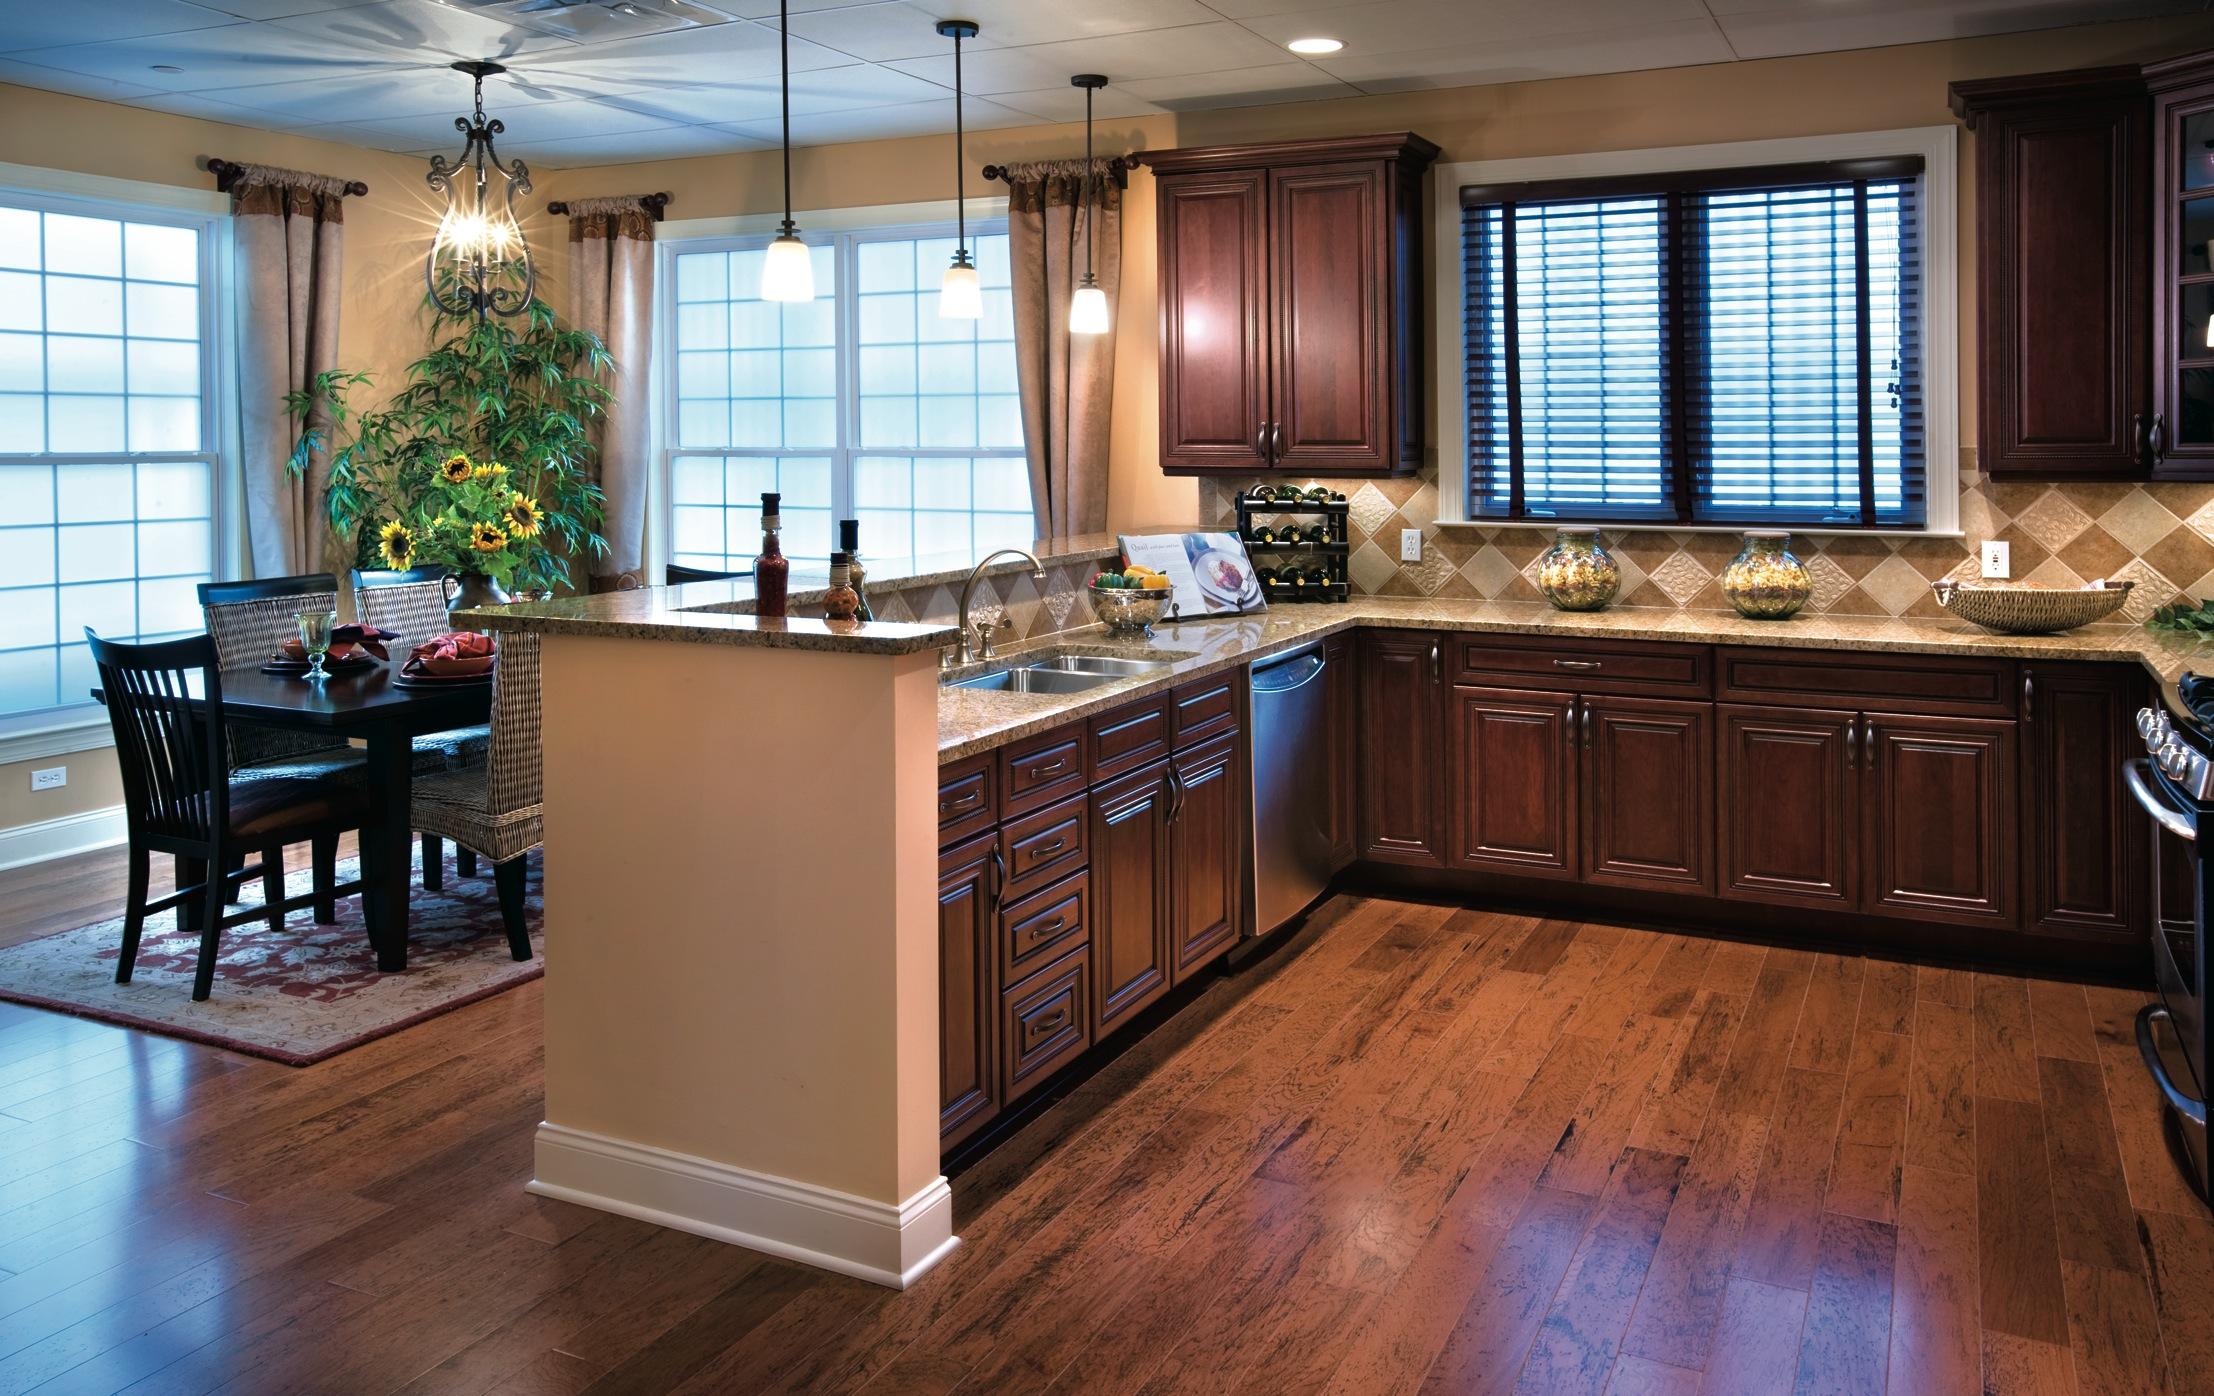 wonderful-kitchen-model-and-minimalist-design.jpg